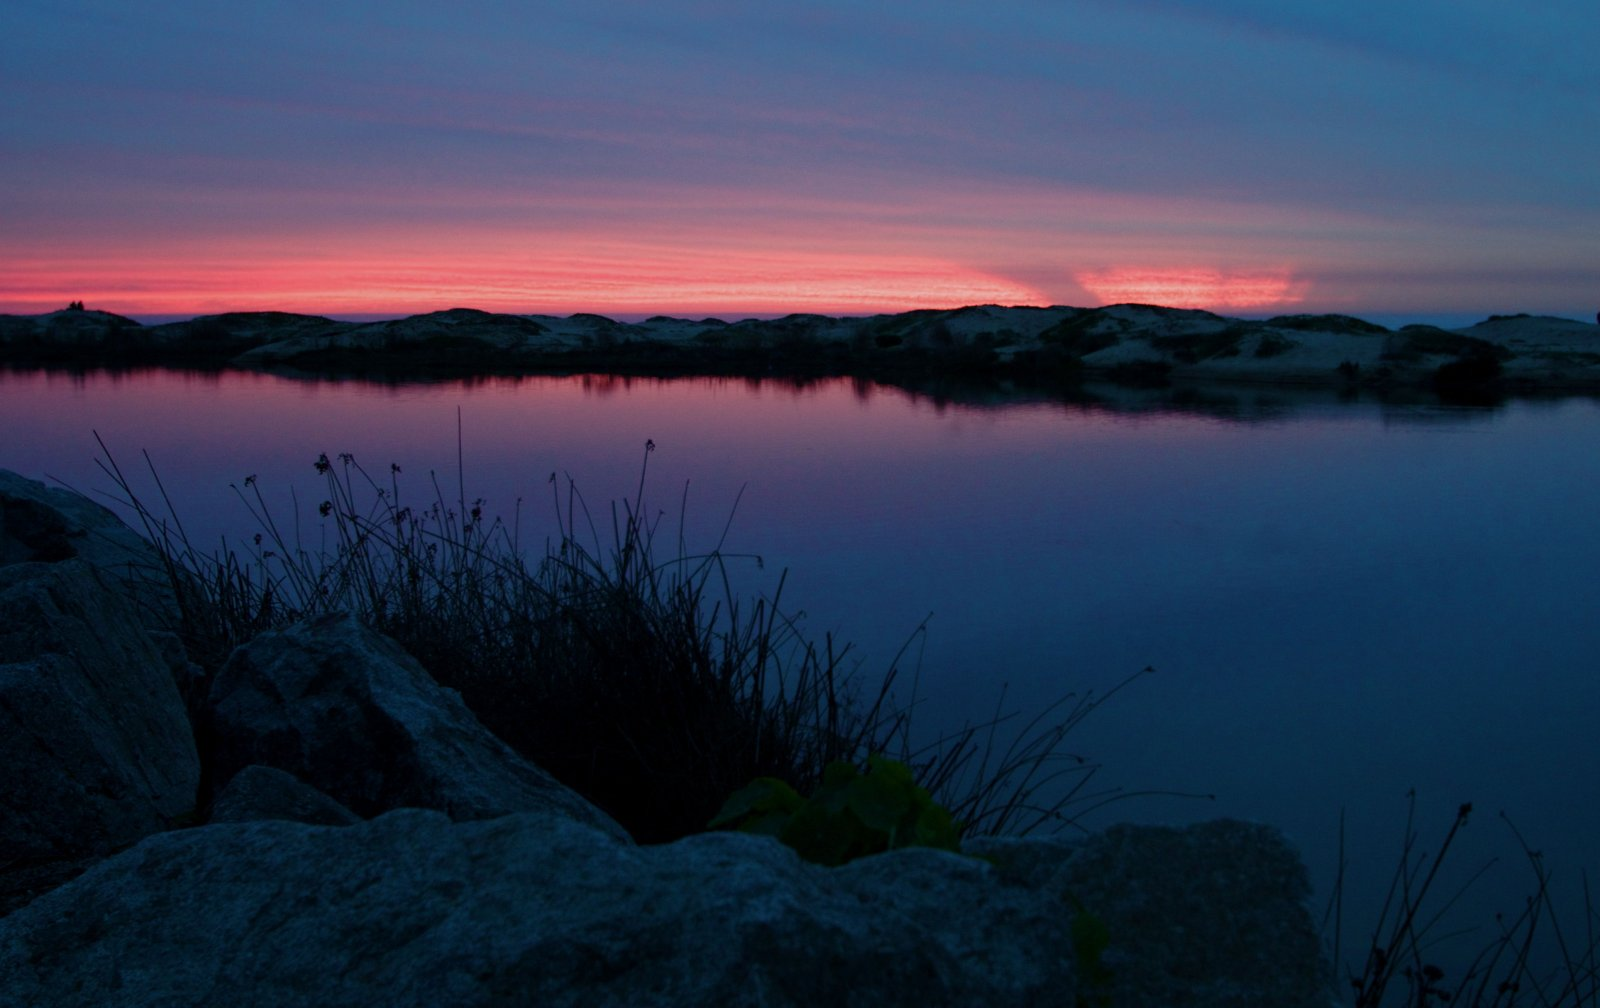 Click image for larger version  Name:Landscape 2.jpg Views:70 Size:144.5 KB ID:94728